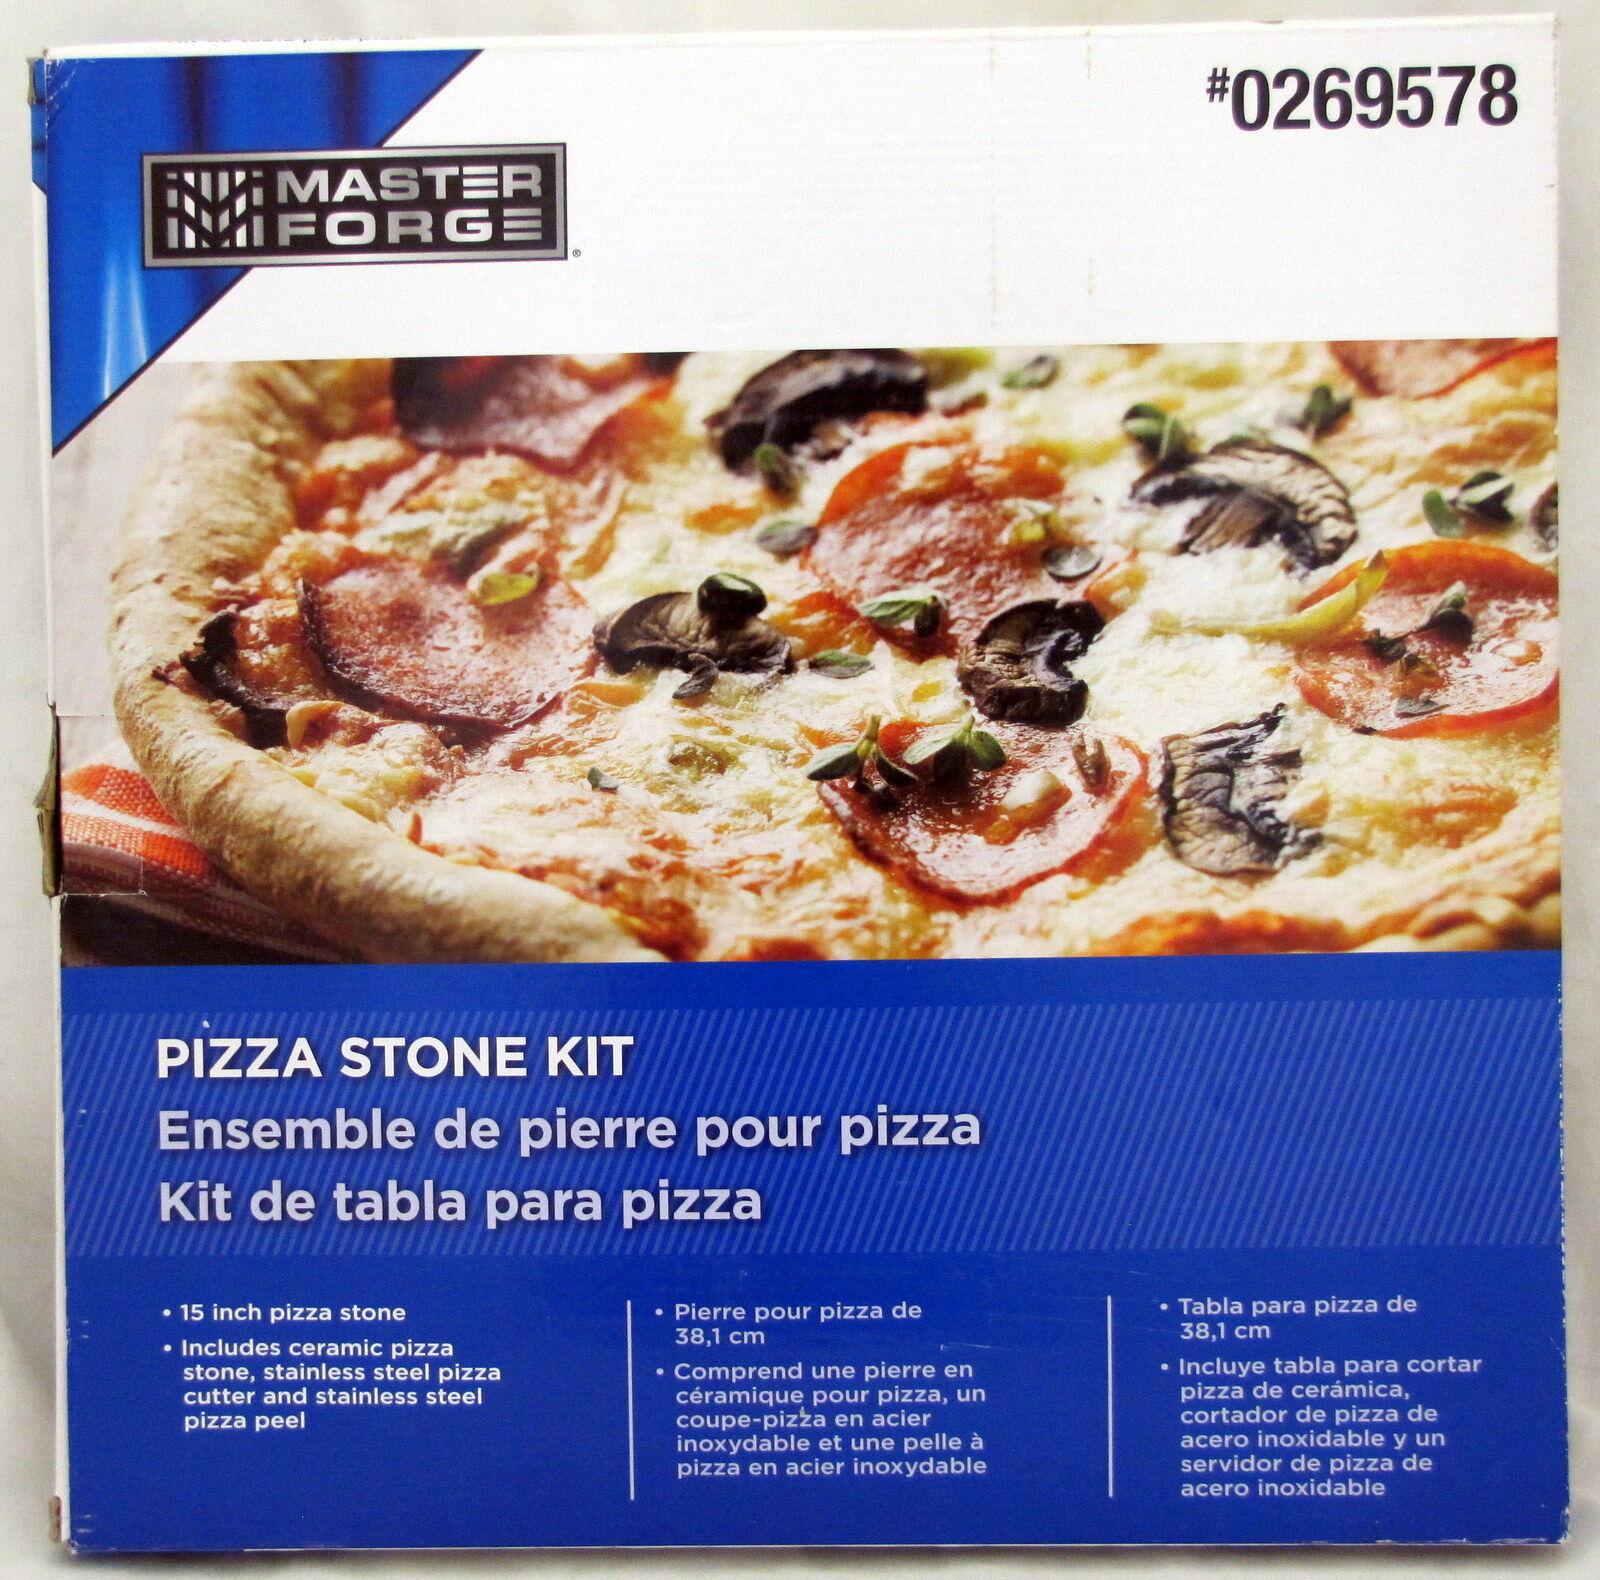 Master Forge Pizza Ceramic Stone Kit 15 Inch Cutter Peel BBQ